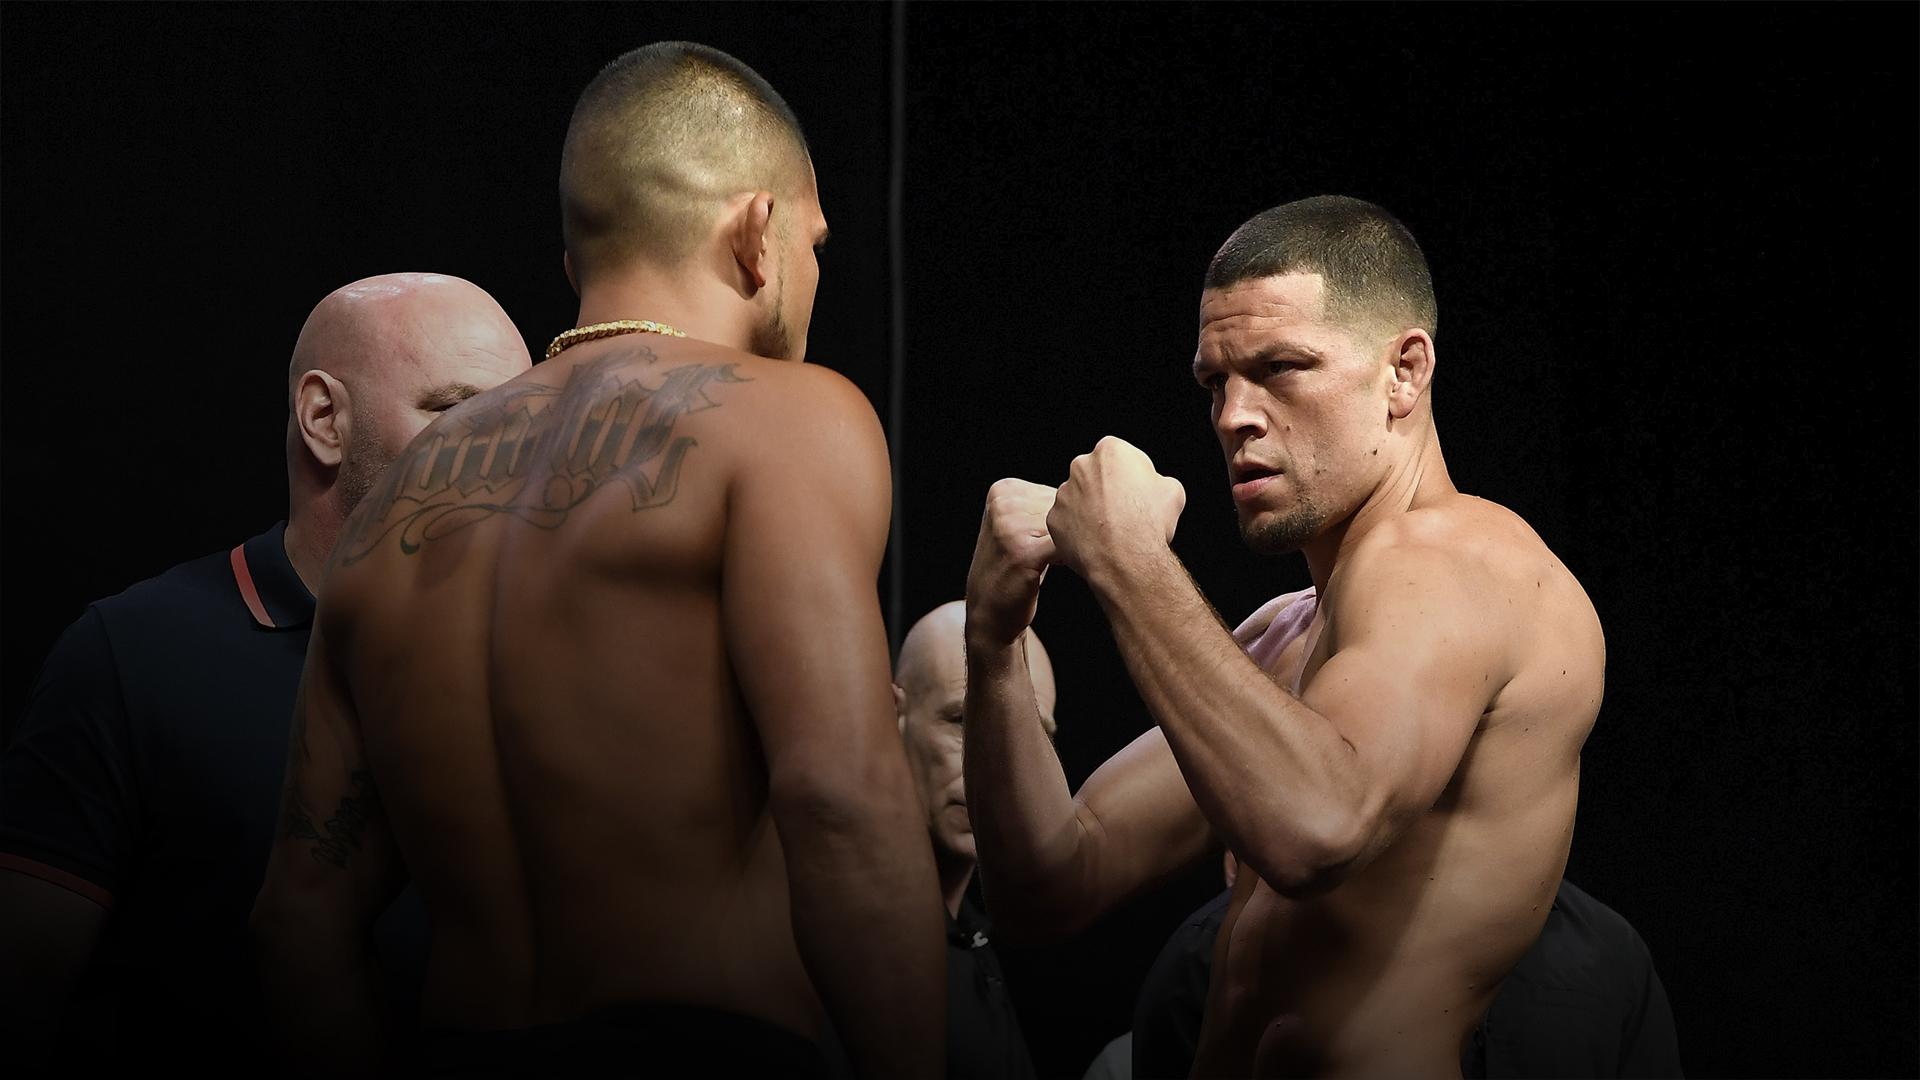 Anthony Pettis vs Nate Diaz